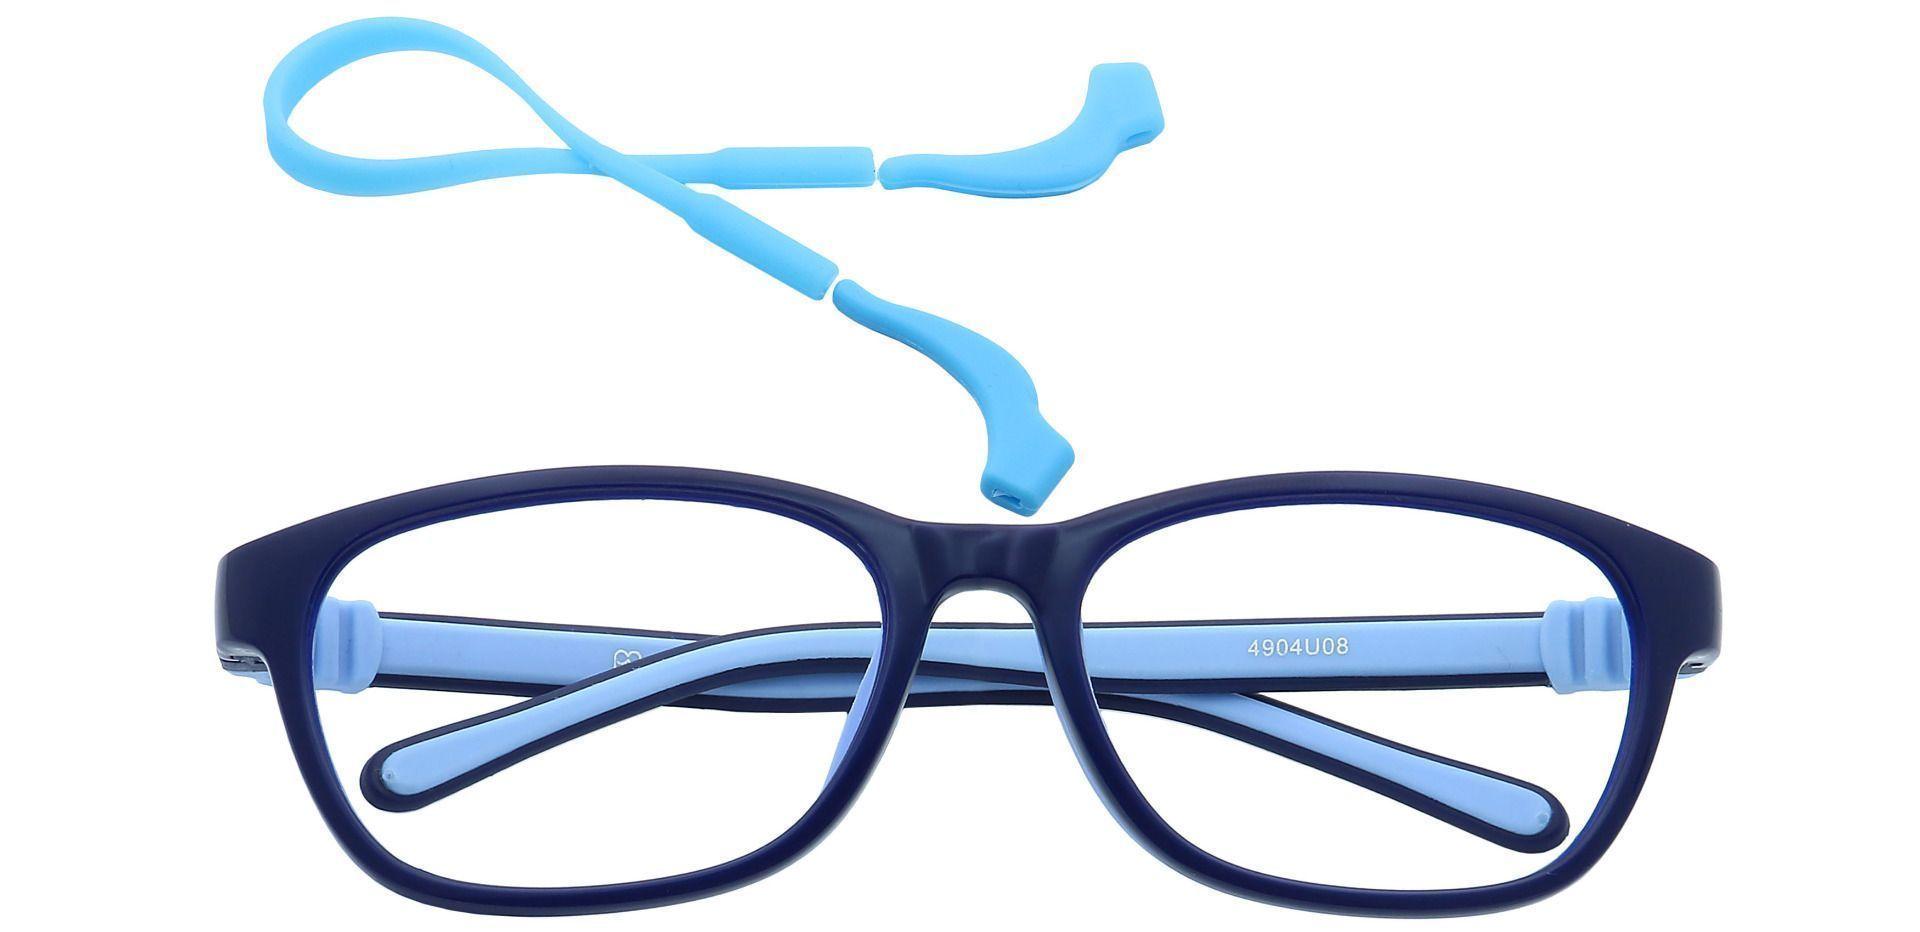 Edison Oval Prescription Glasses - Navy Blue/light Blue